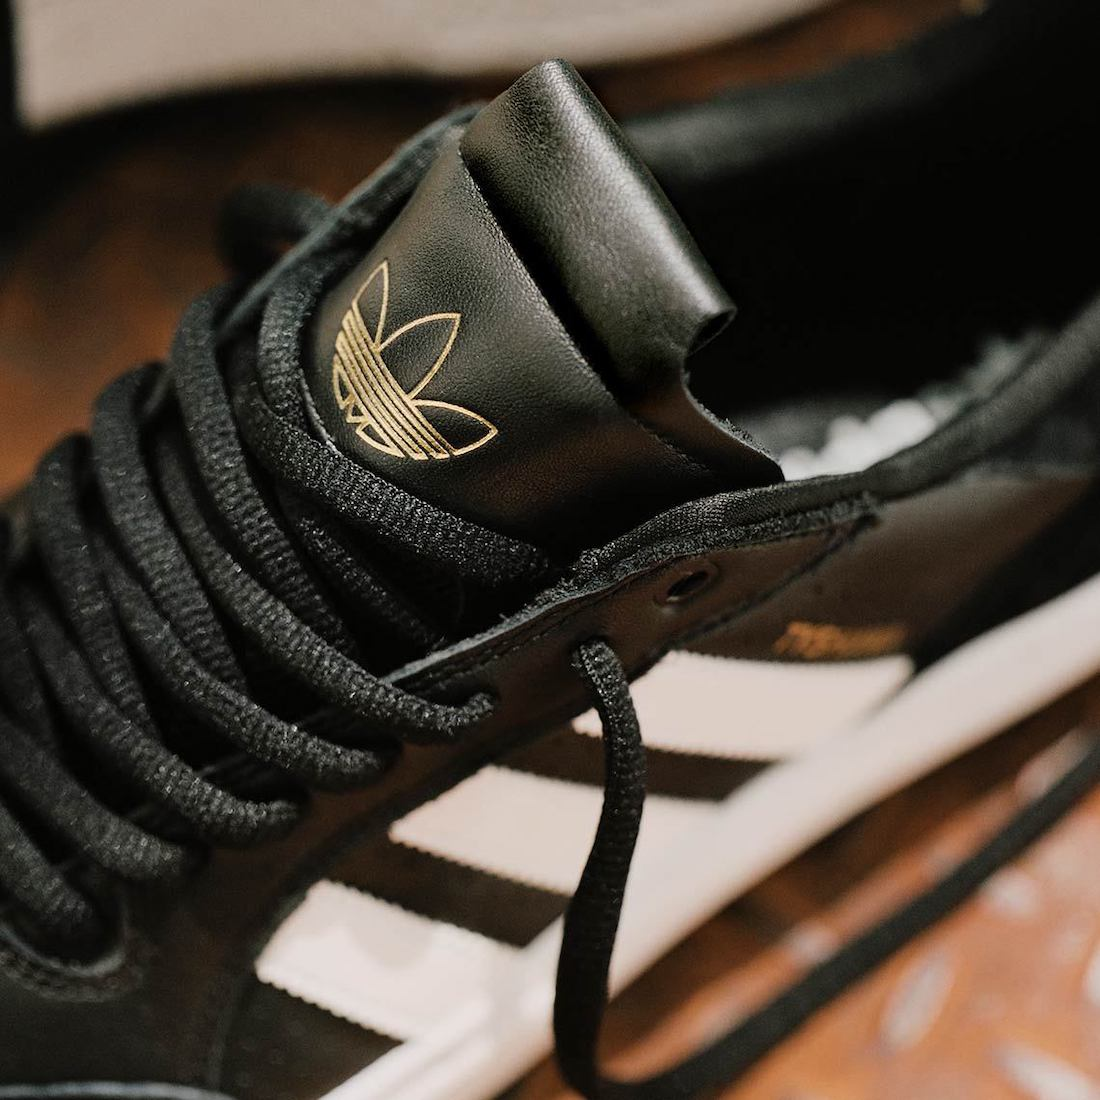 adidas Tyshawn Low Black White Gold GW4891 Release Date Info